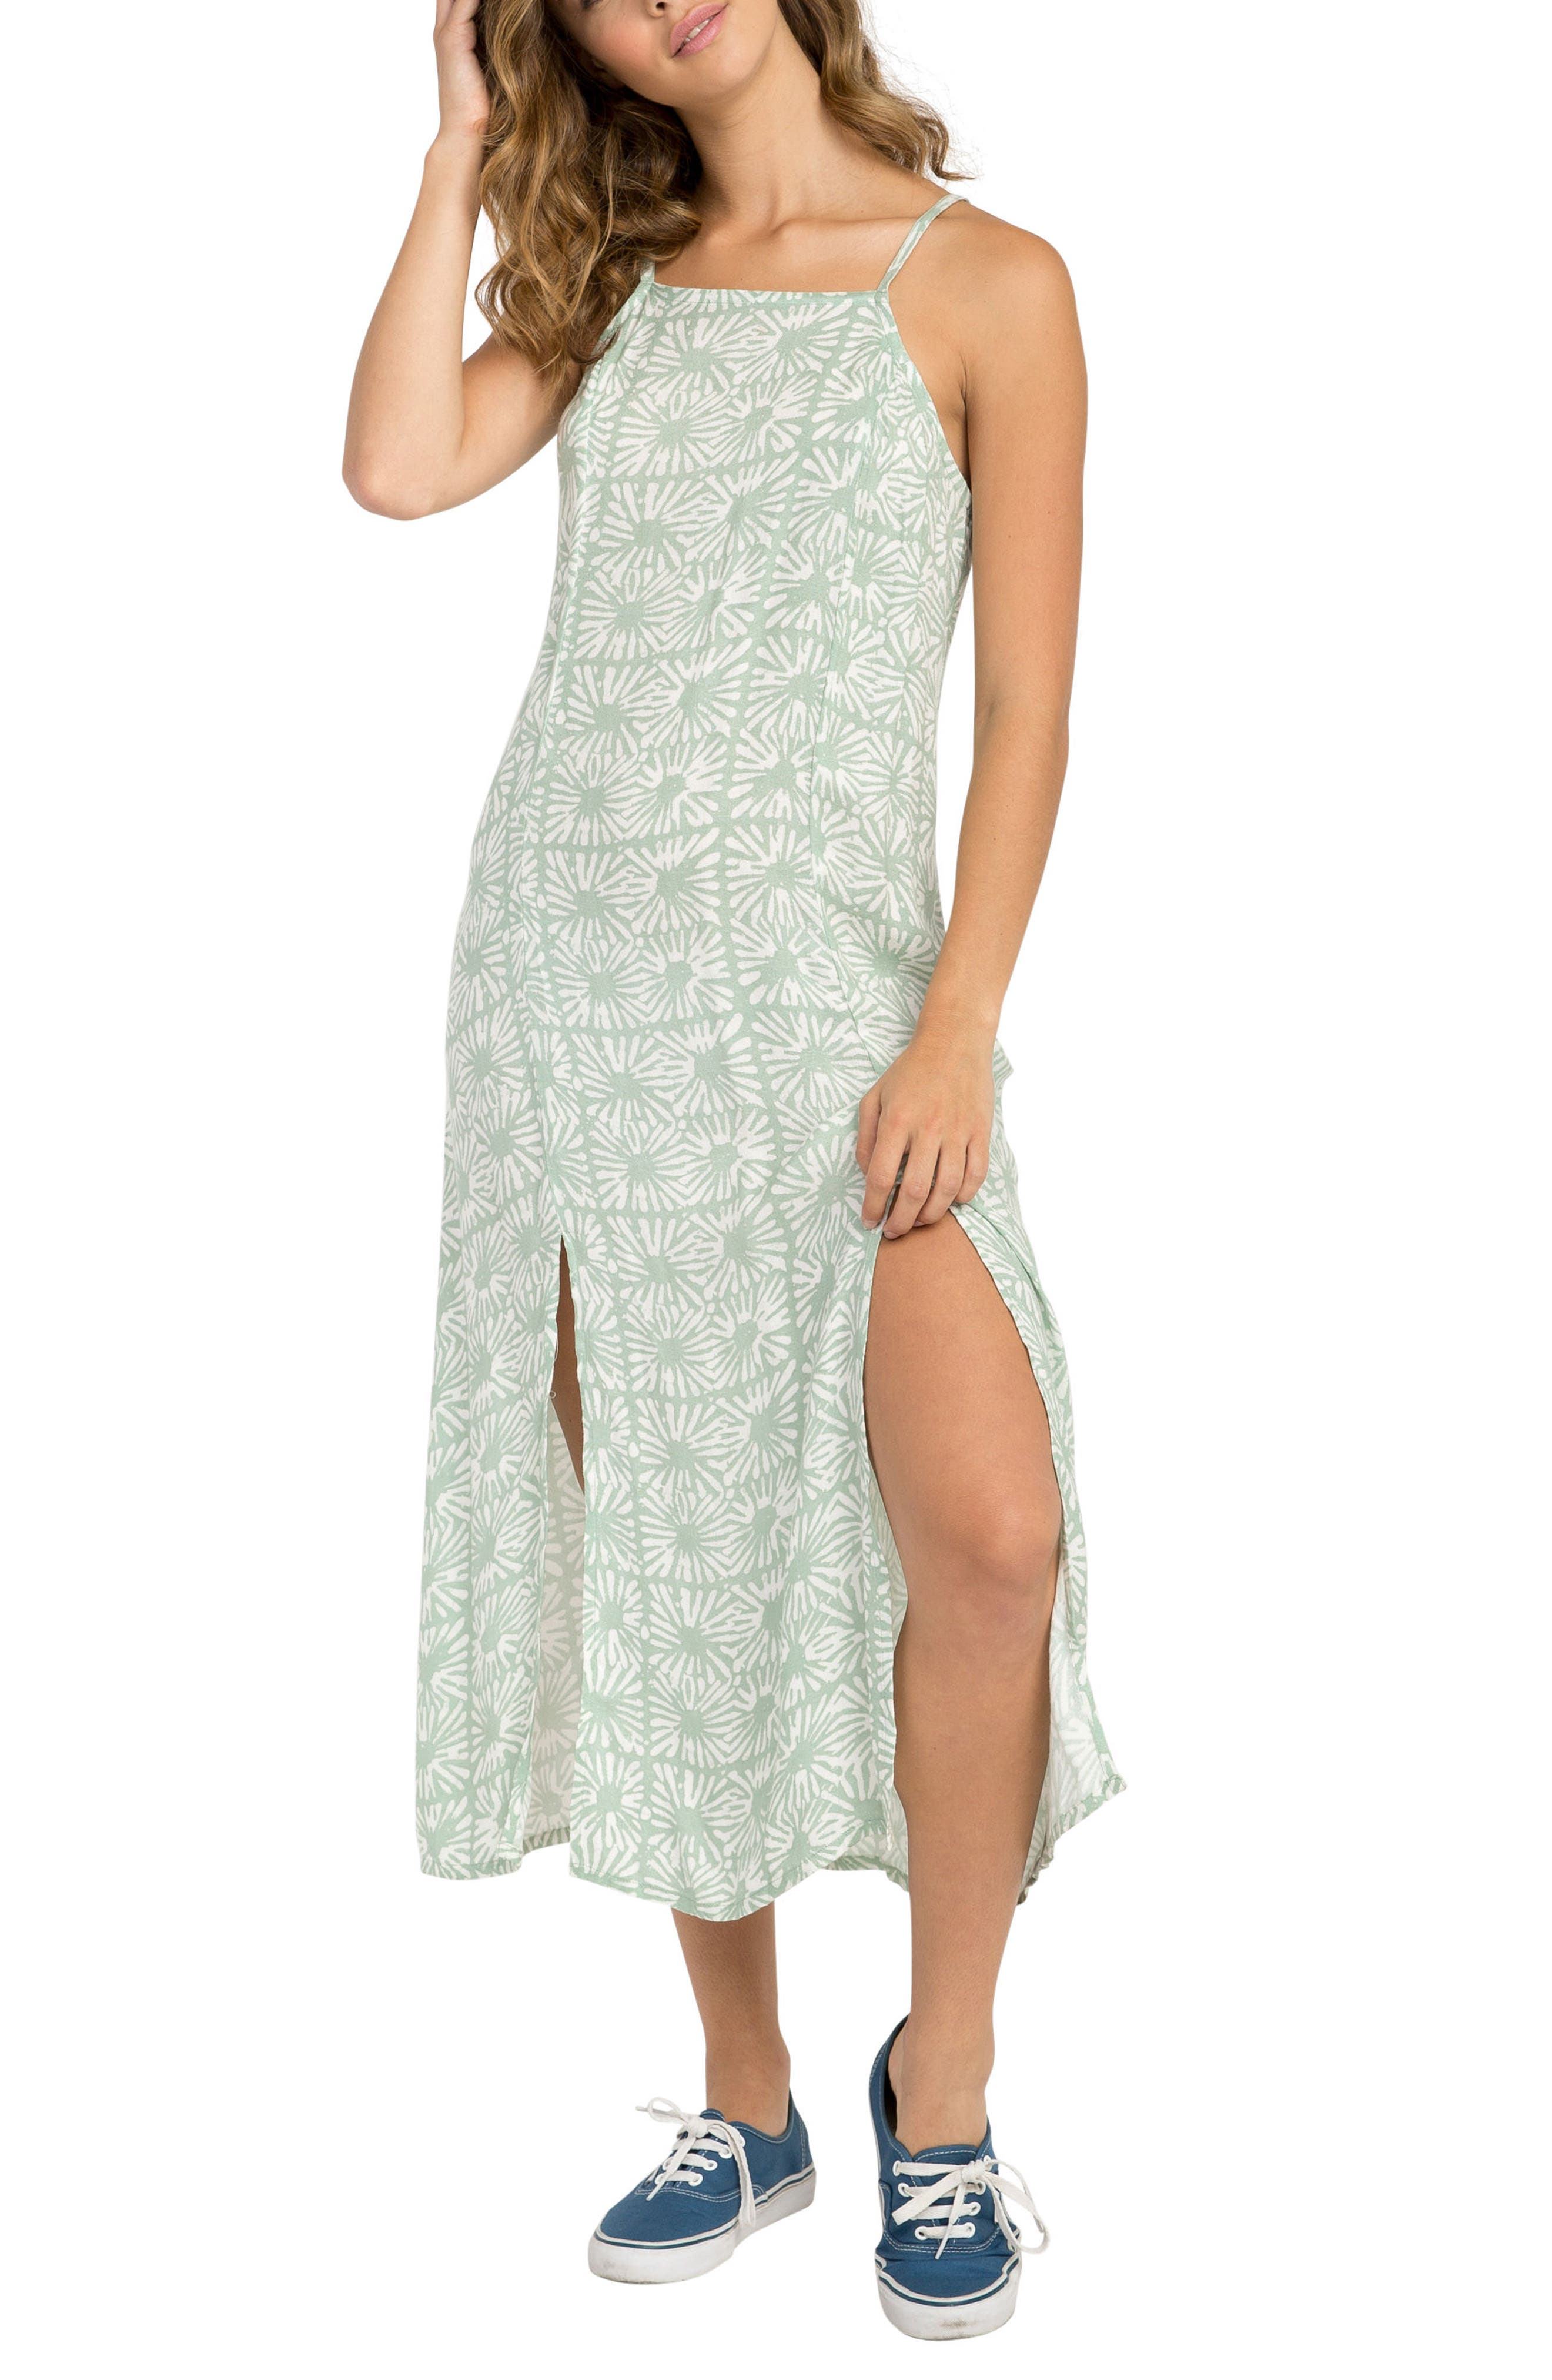 Garland Print Midi Dress,                         Main,                         color, 340